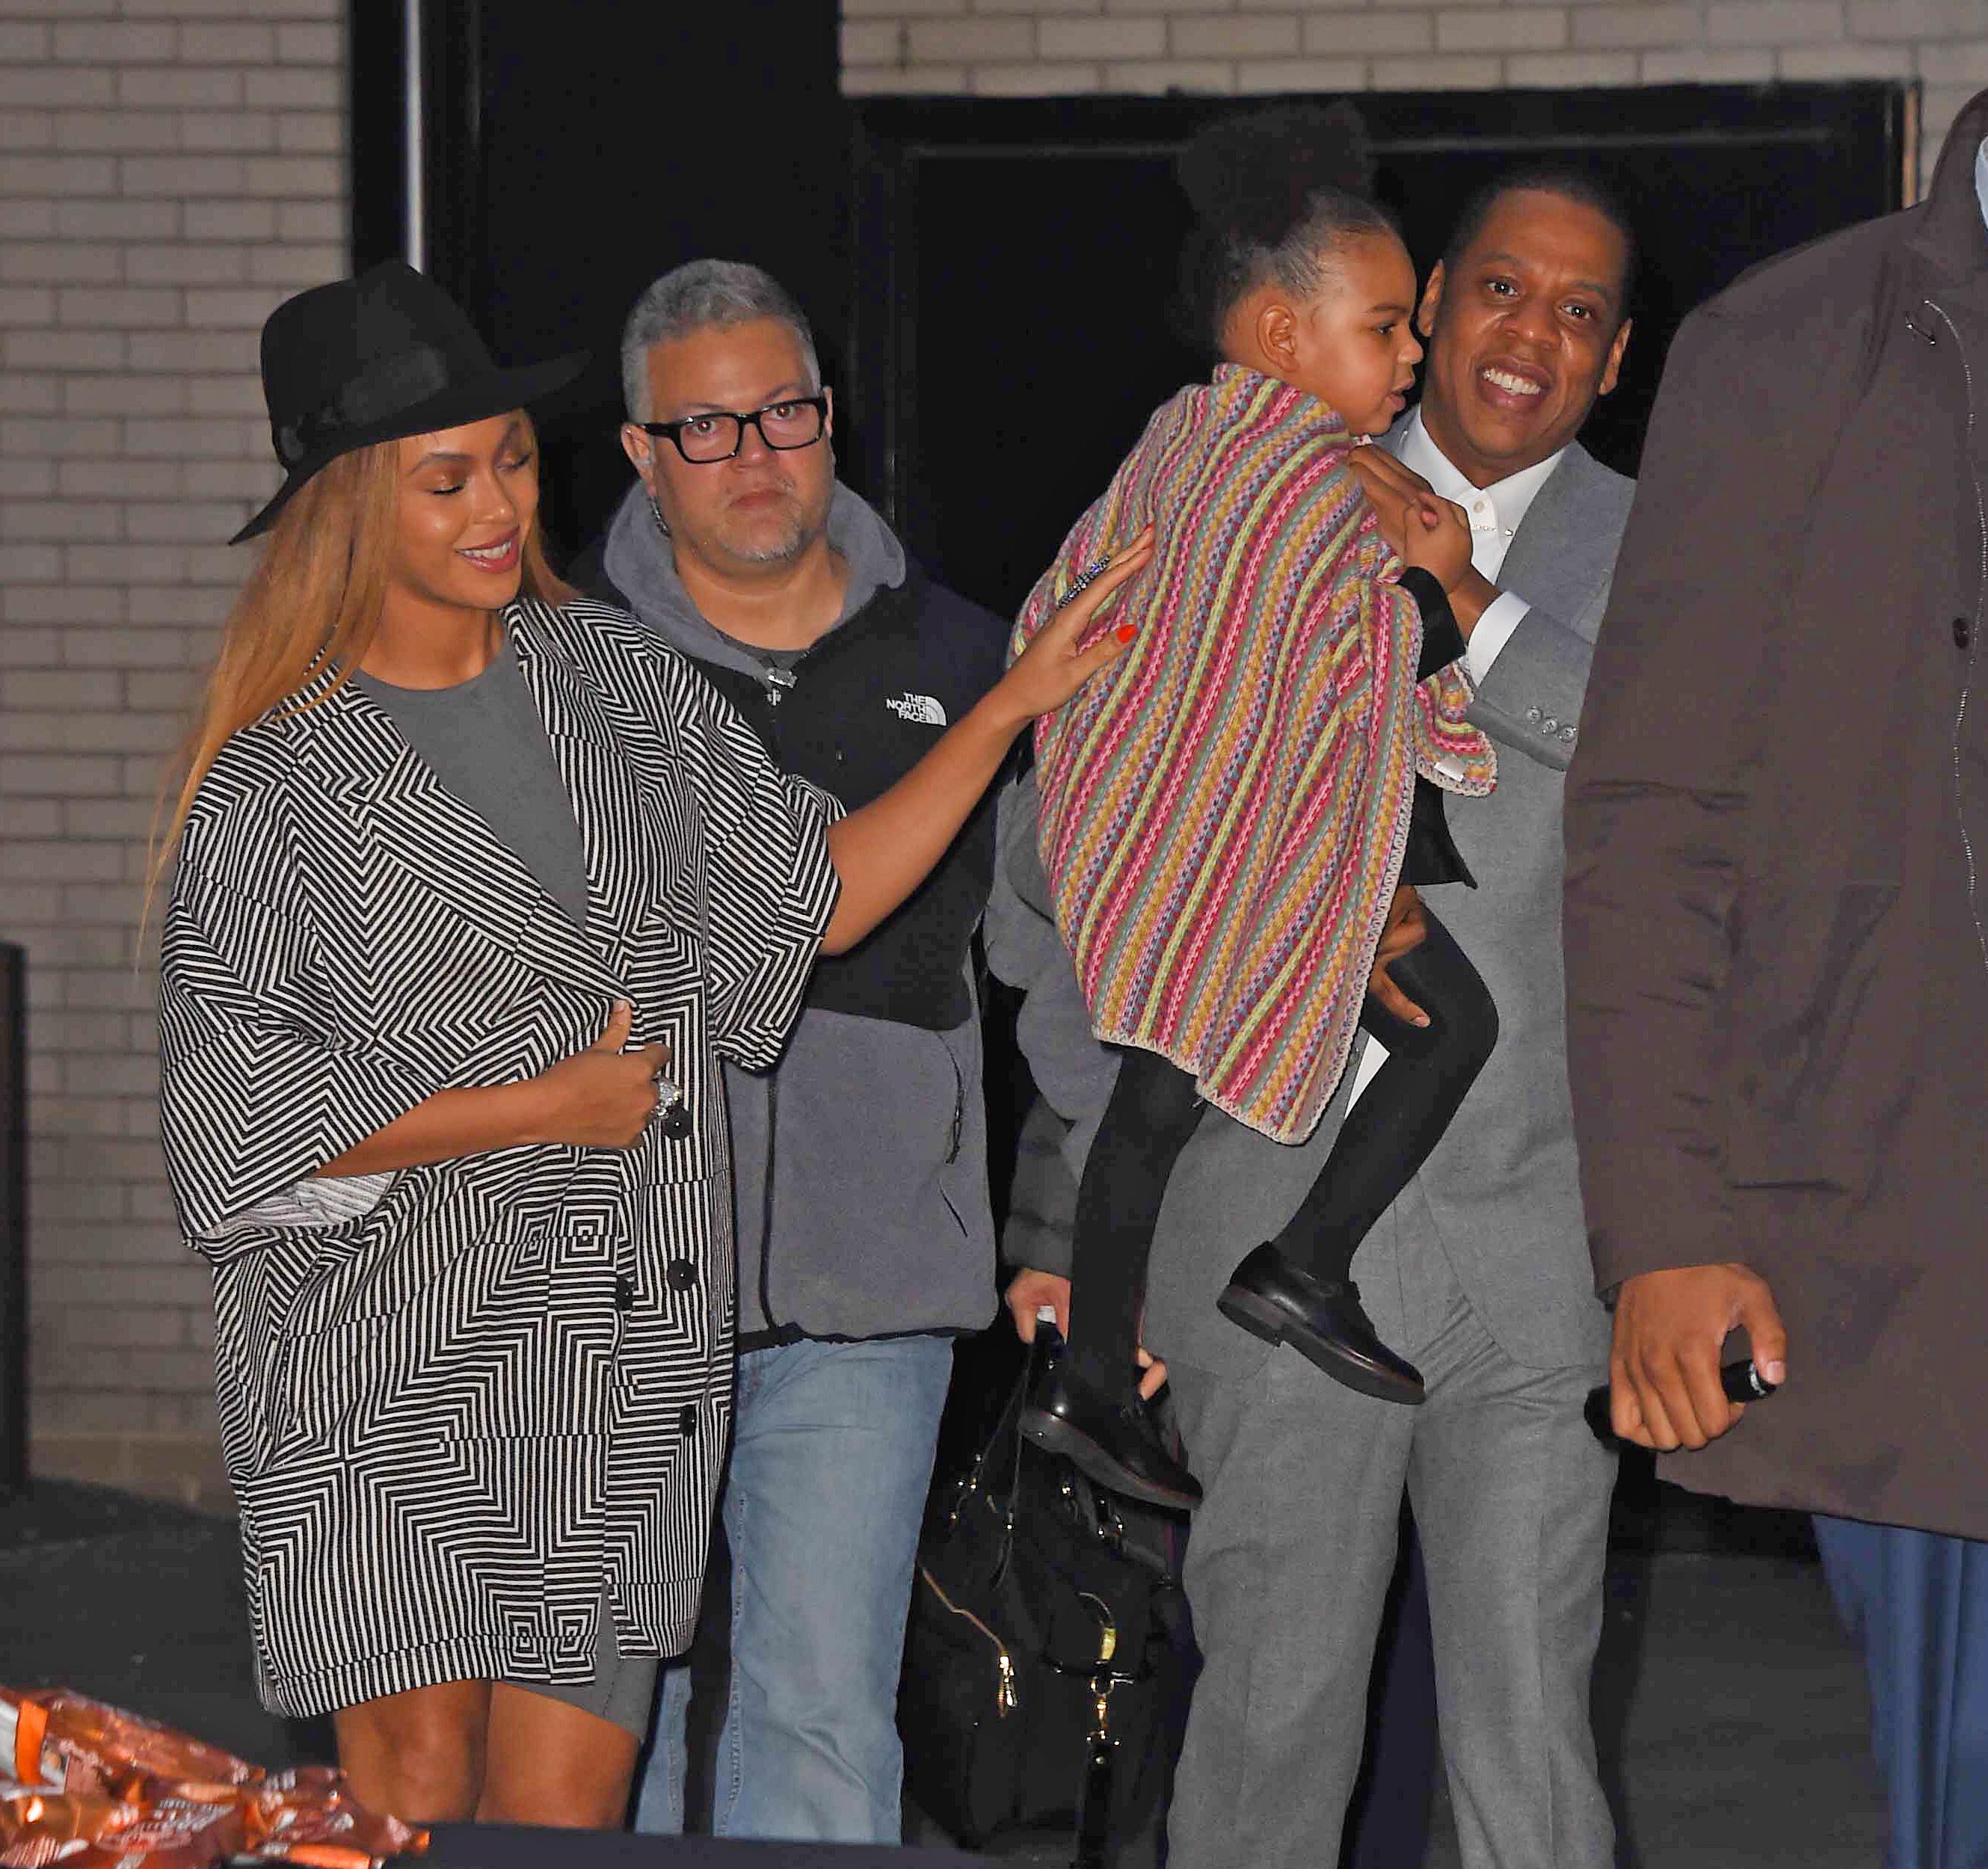 Celebrity Sightings In New York City - December 7, 2014